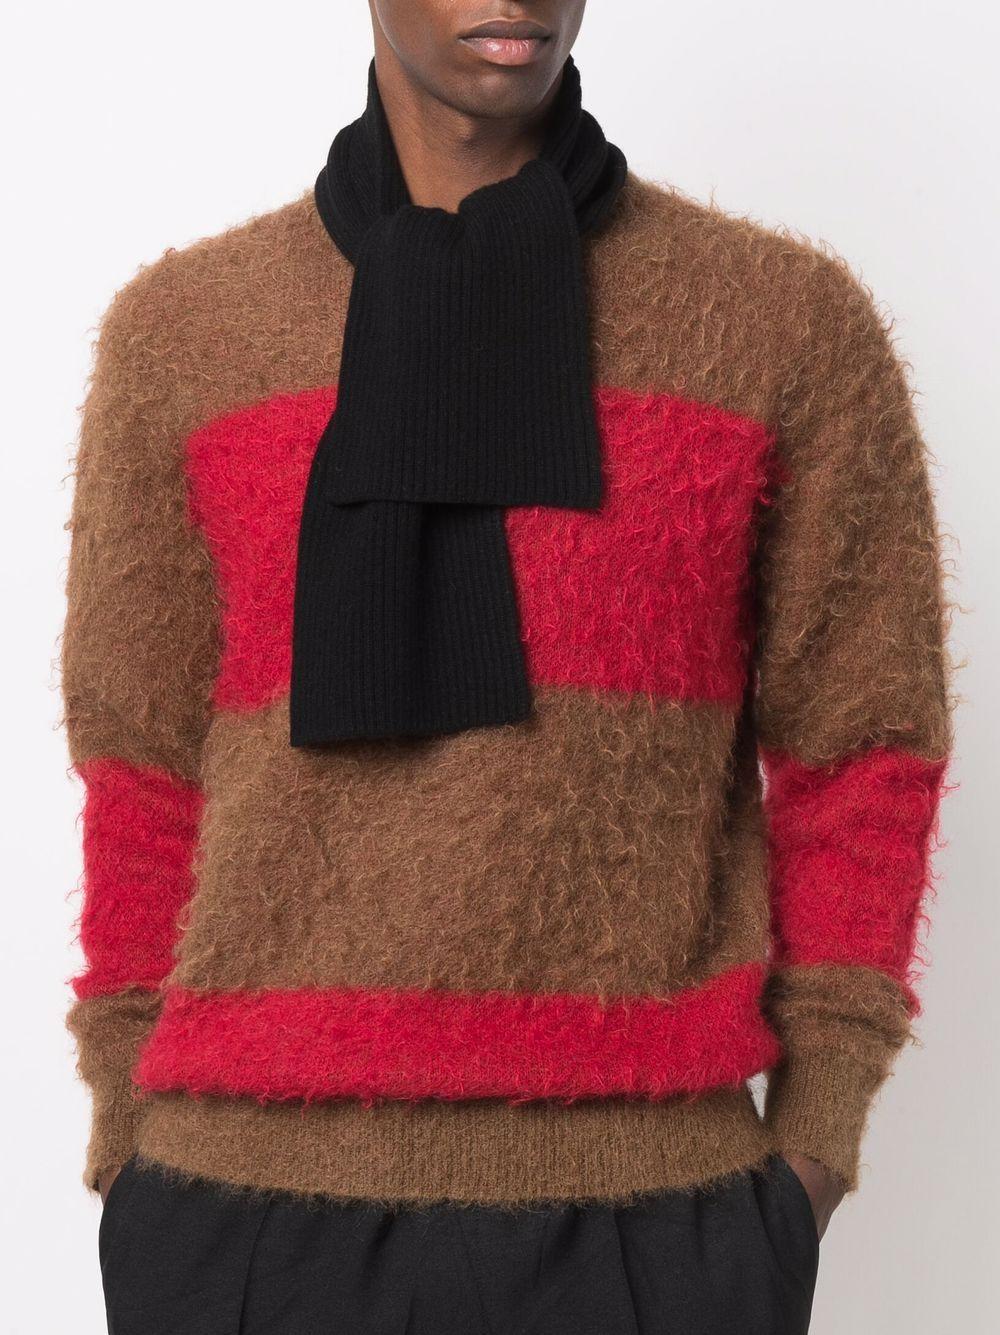 tala scarf unisex black in cashmere DRIES VAN NOTEN      TALA 3701900